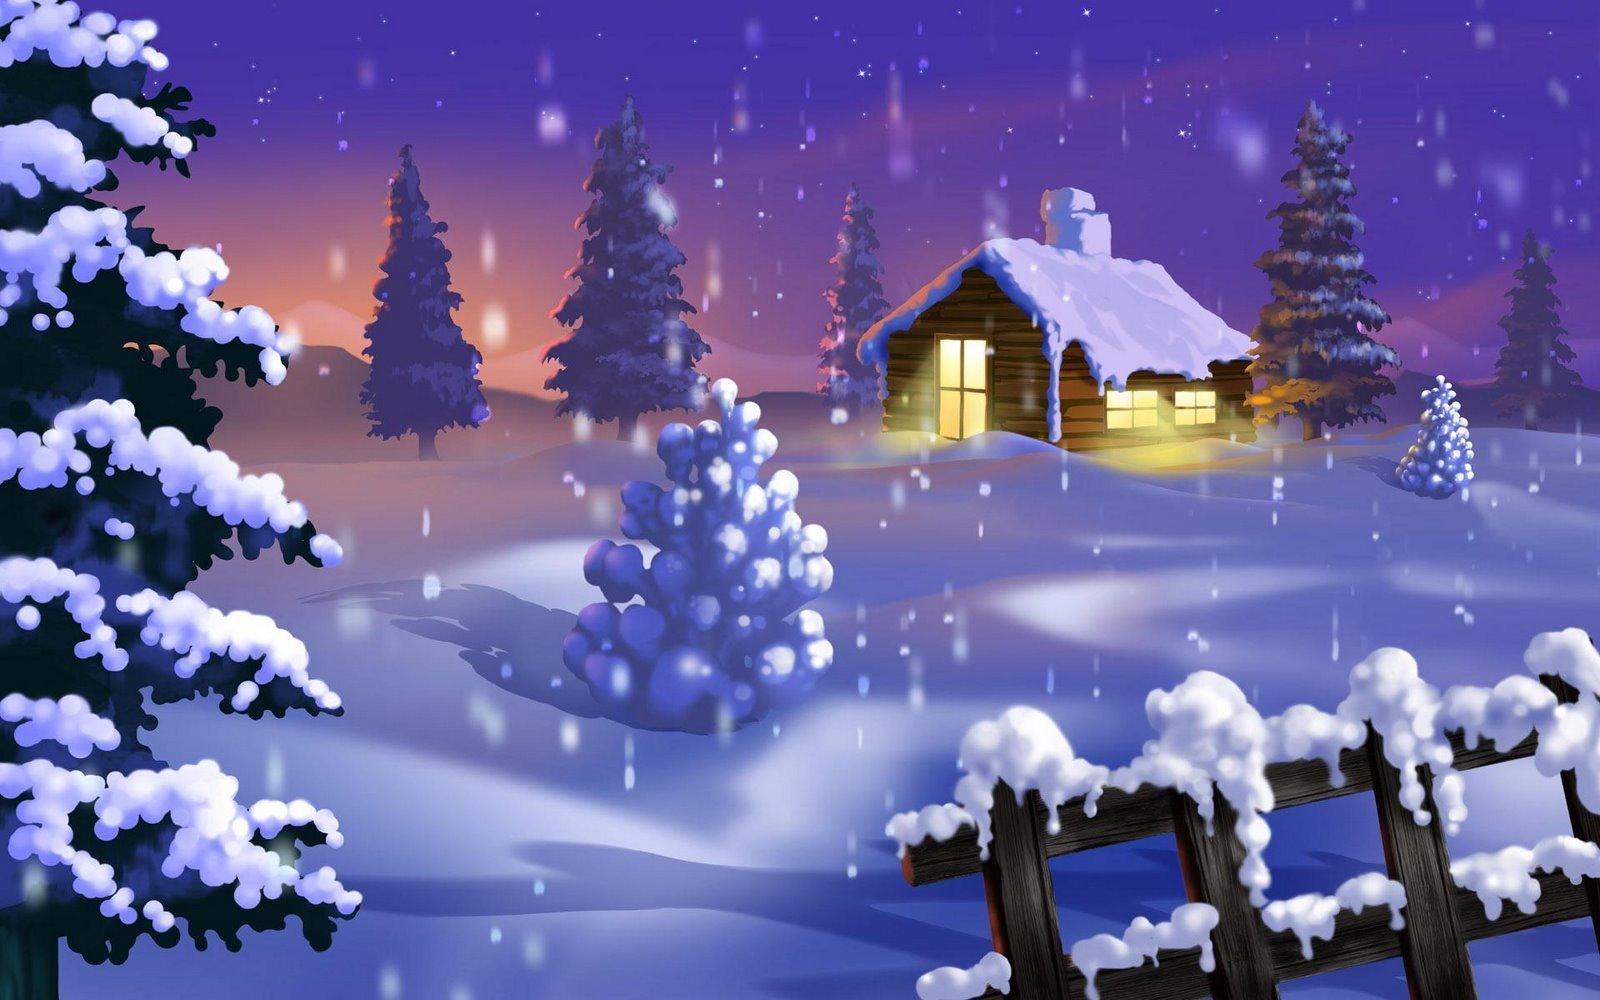 Christmas Wallpaper 1600x1000